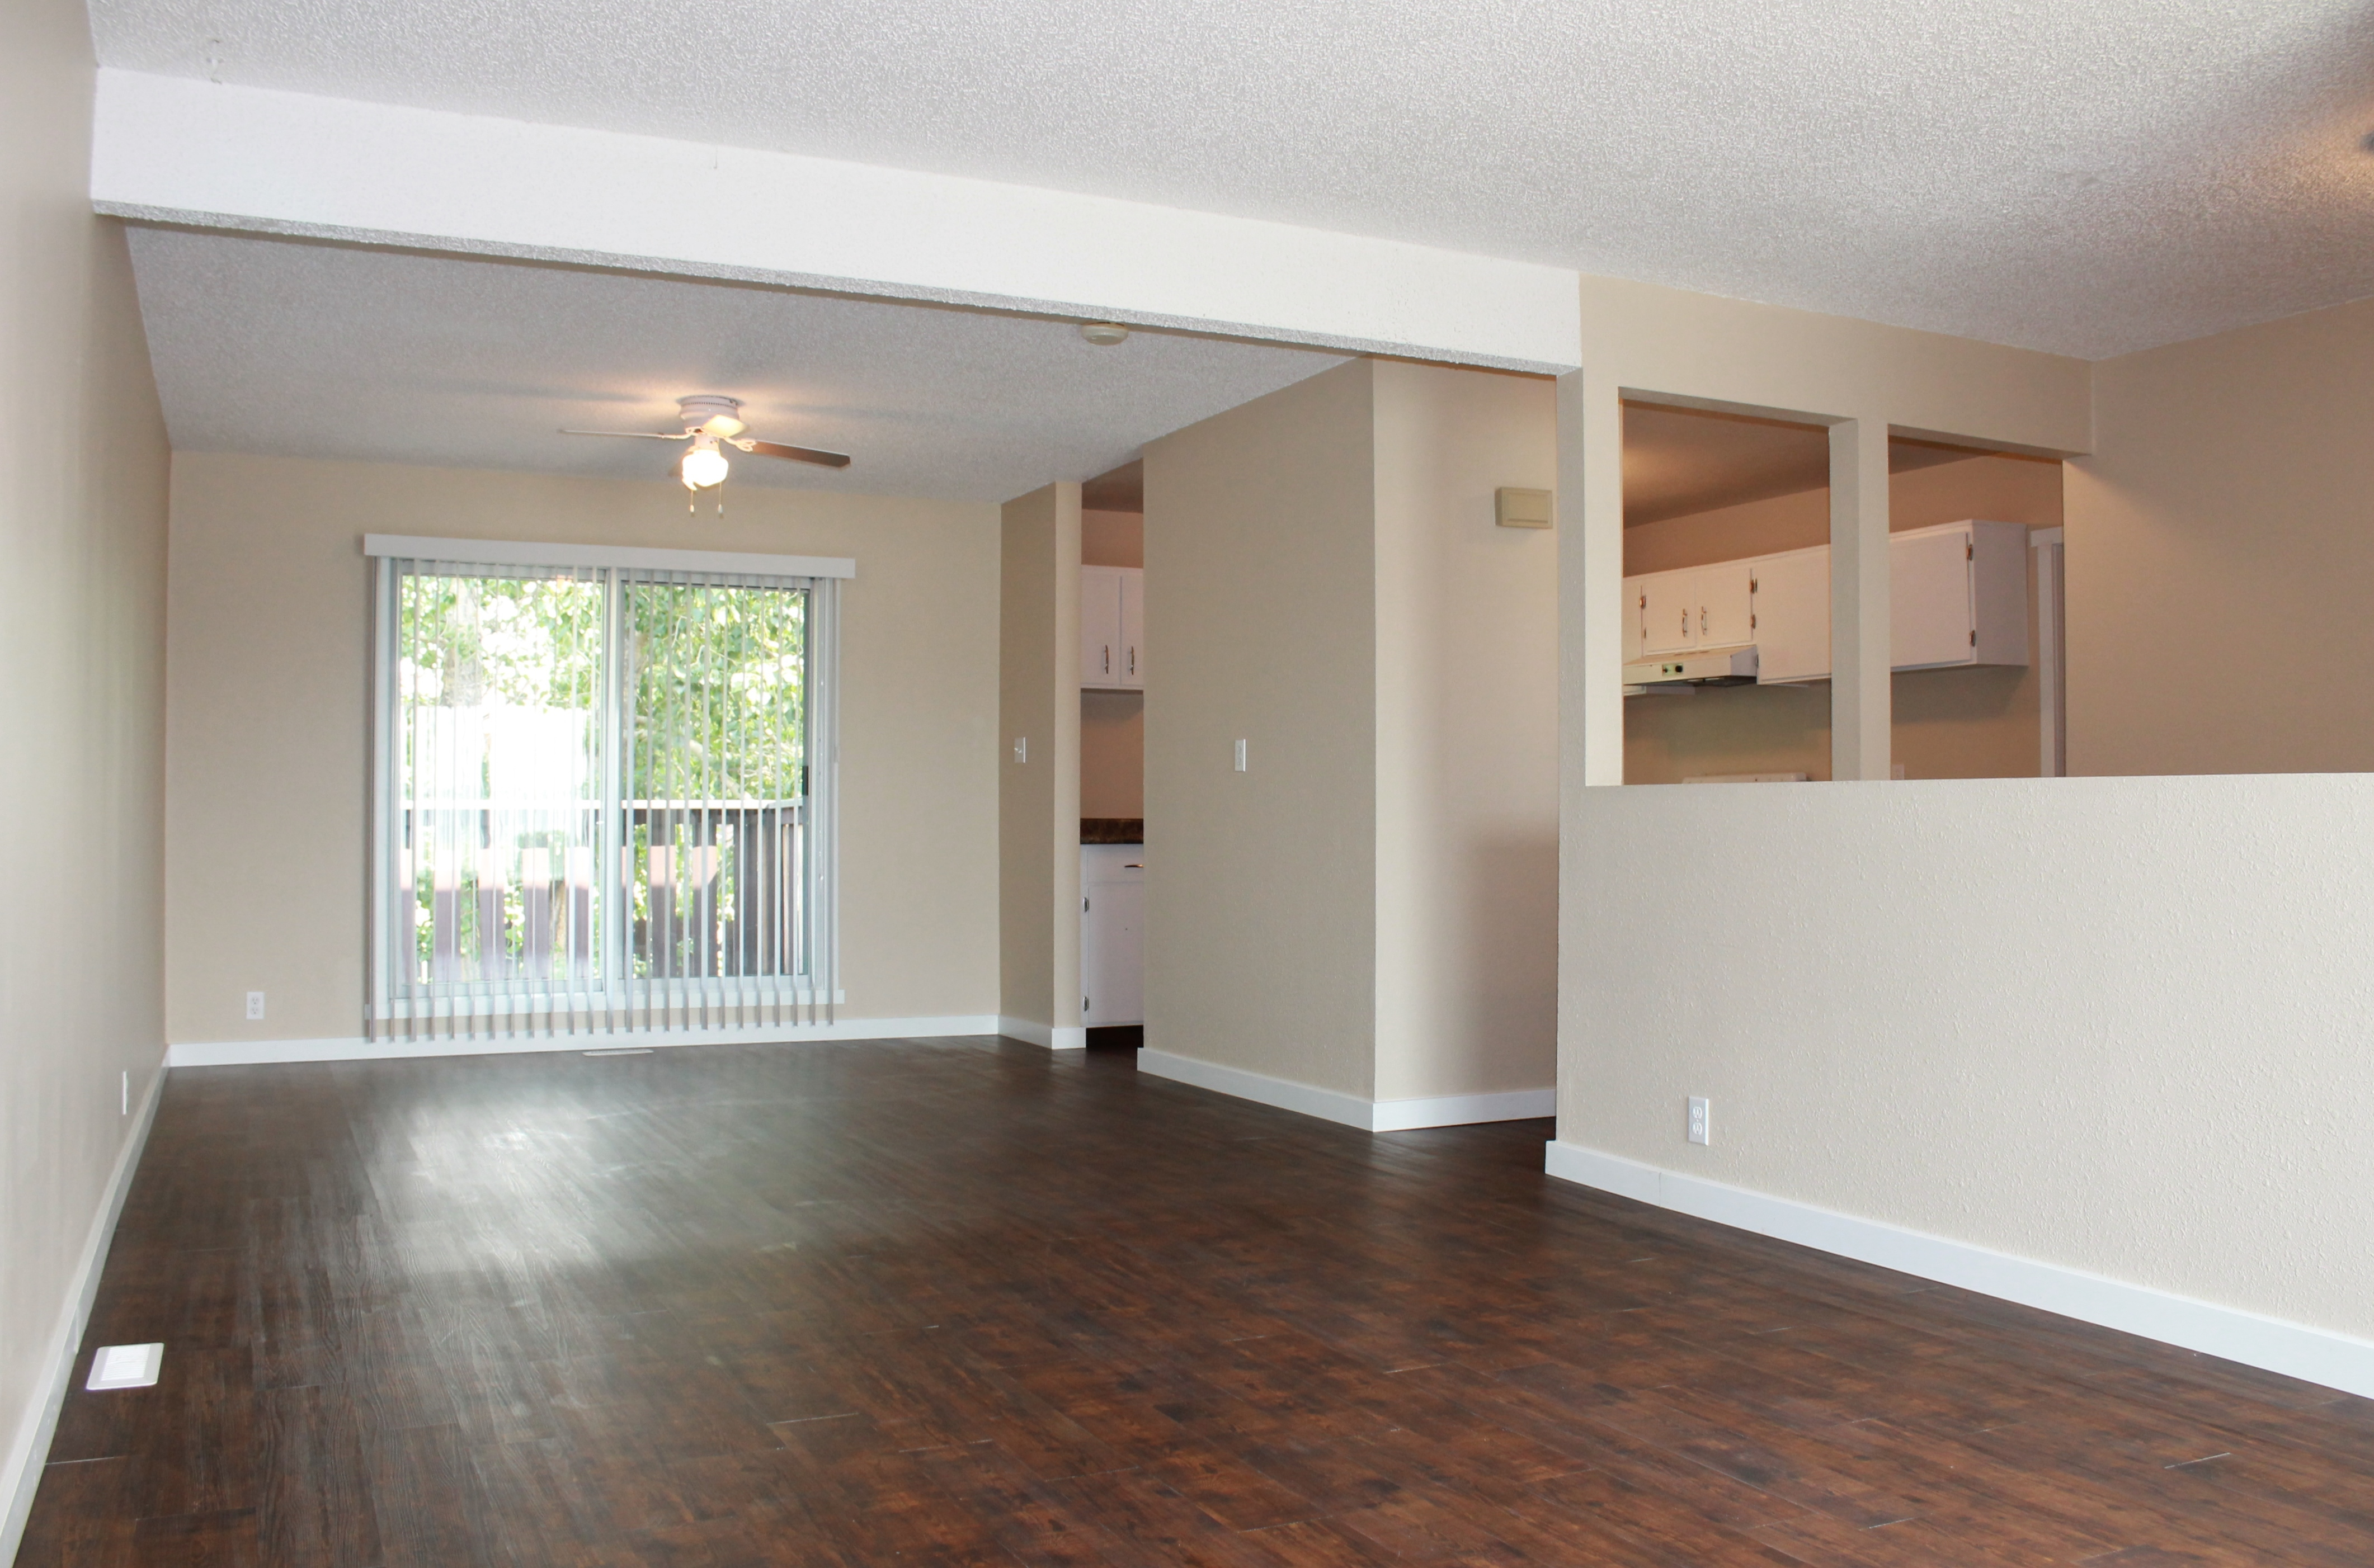 Loran Townhomes Dawson Creek Apartments